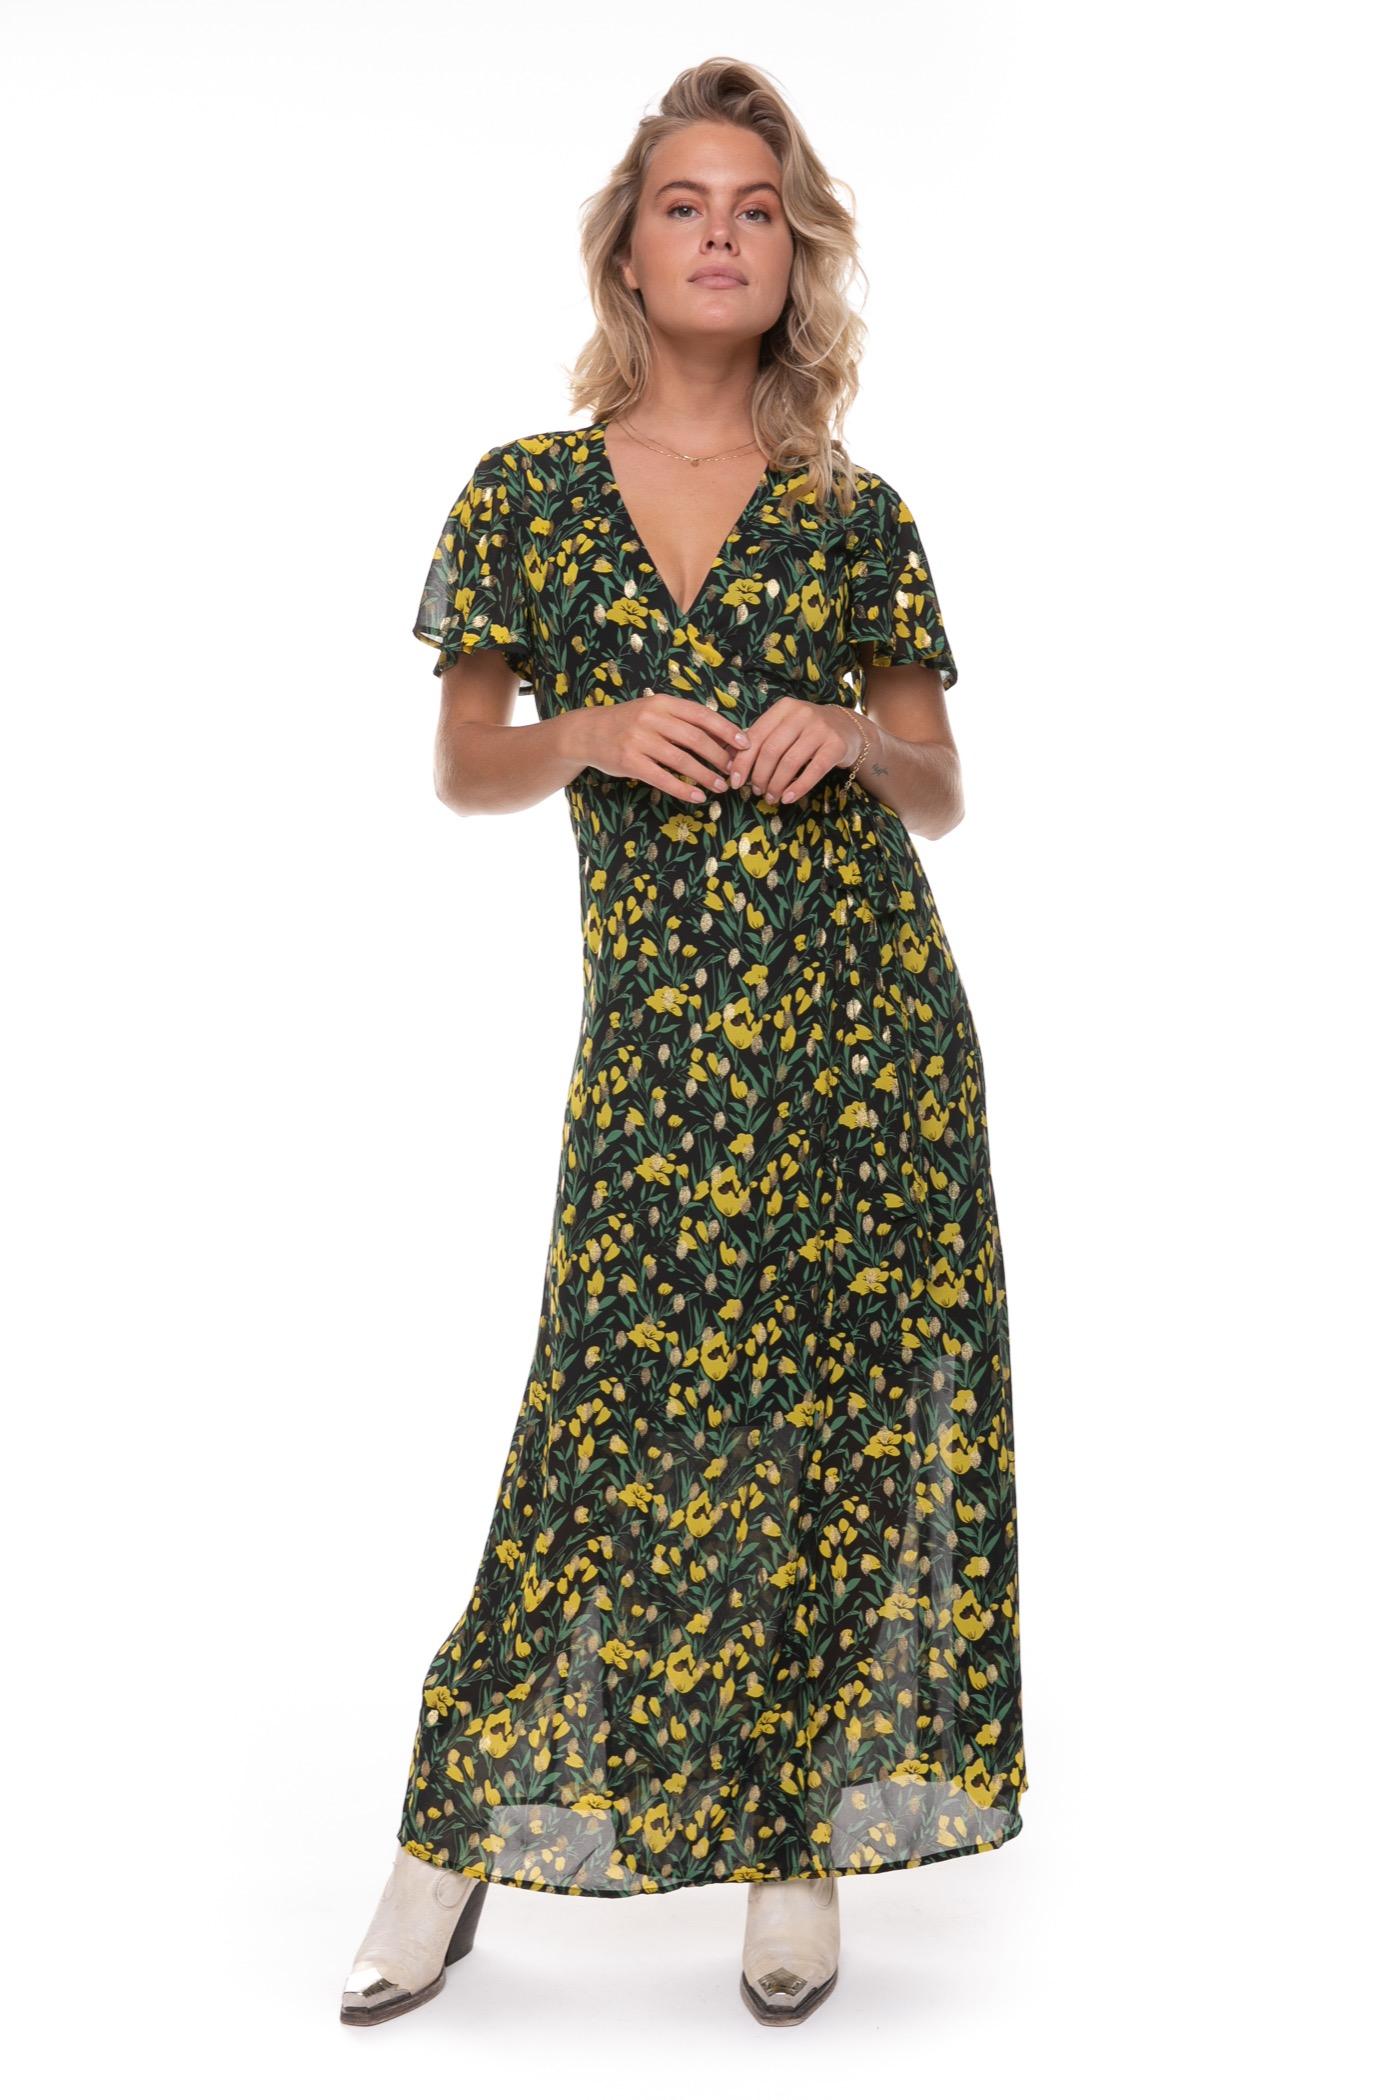 Zwarte dames jurk met bloemen print Colourful Rebel - Ava Flower Maxi